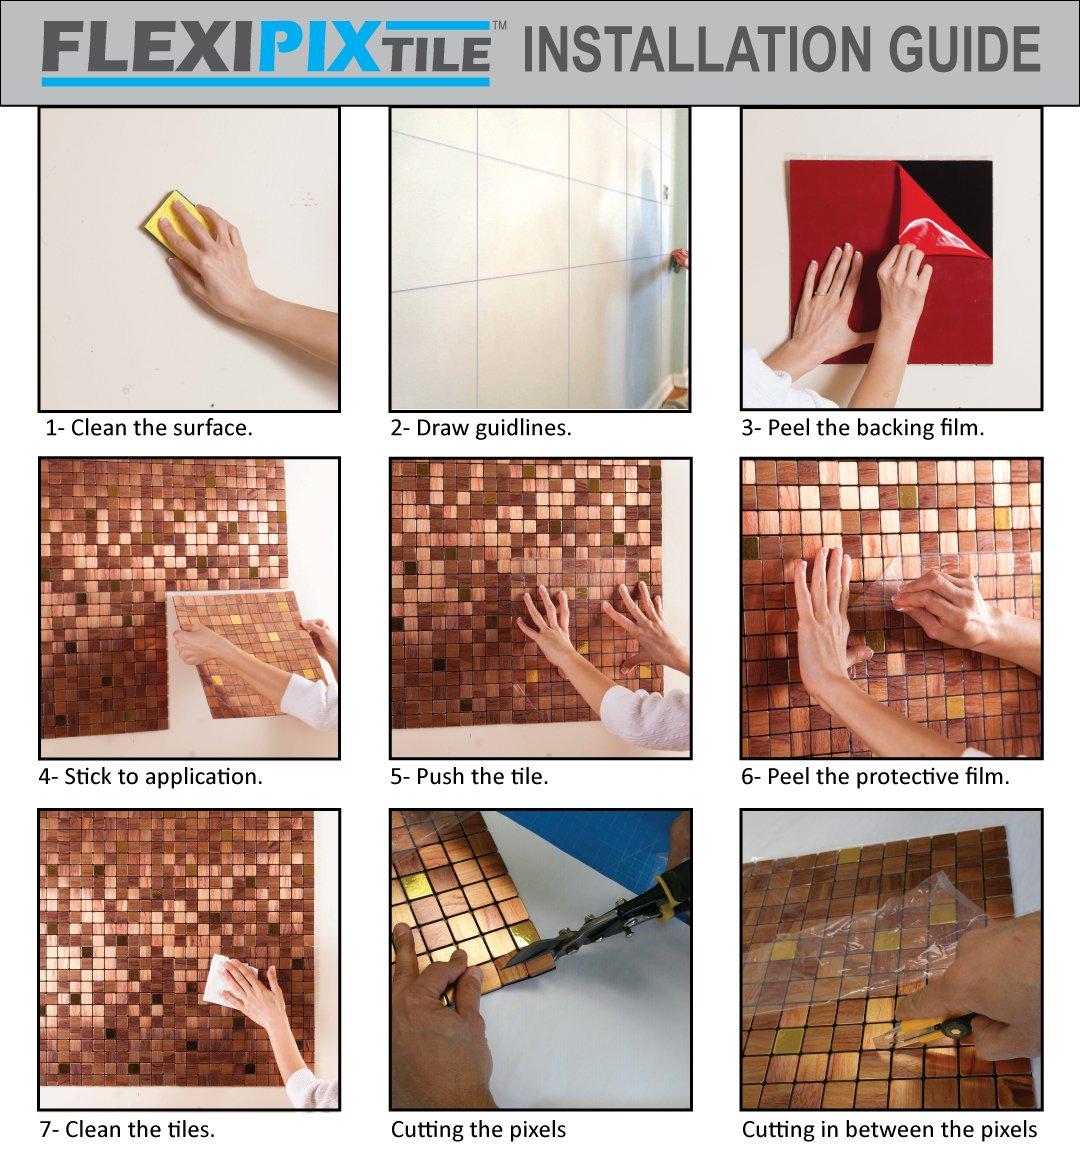 amazon com flexipixtile modern aluminum mosaic tile peel amazon com flexipixtile modern aluminum mosaic tile peel stick backsplash accent wall 1 sq ft the palace home kitchen